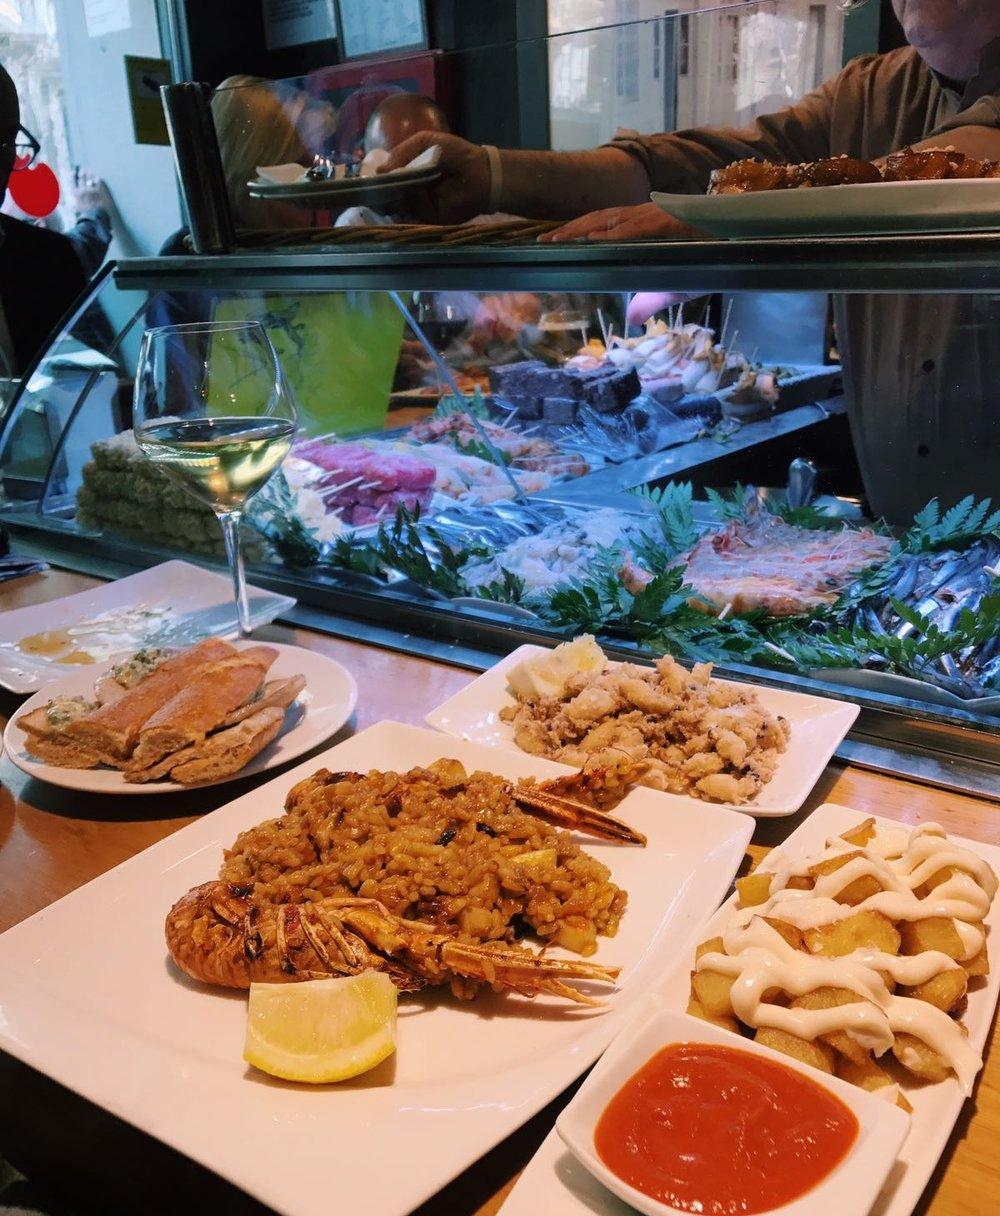 From left: Pork sandwich, Paella, Fried calamari, those addictive potatoes!